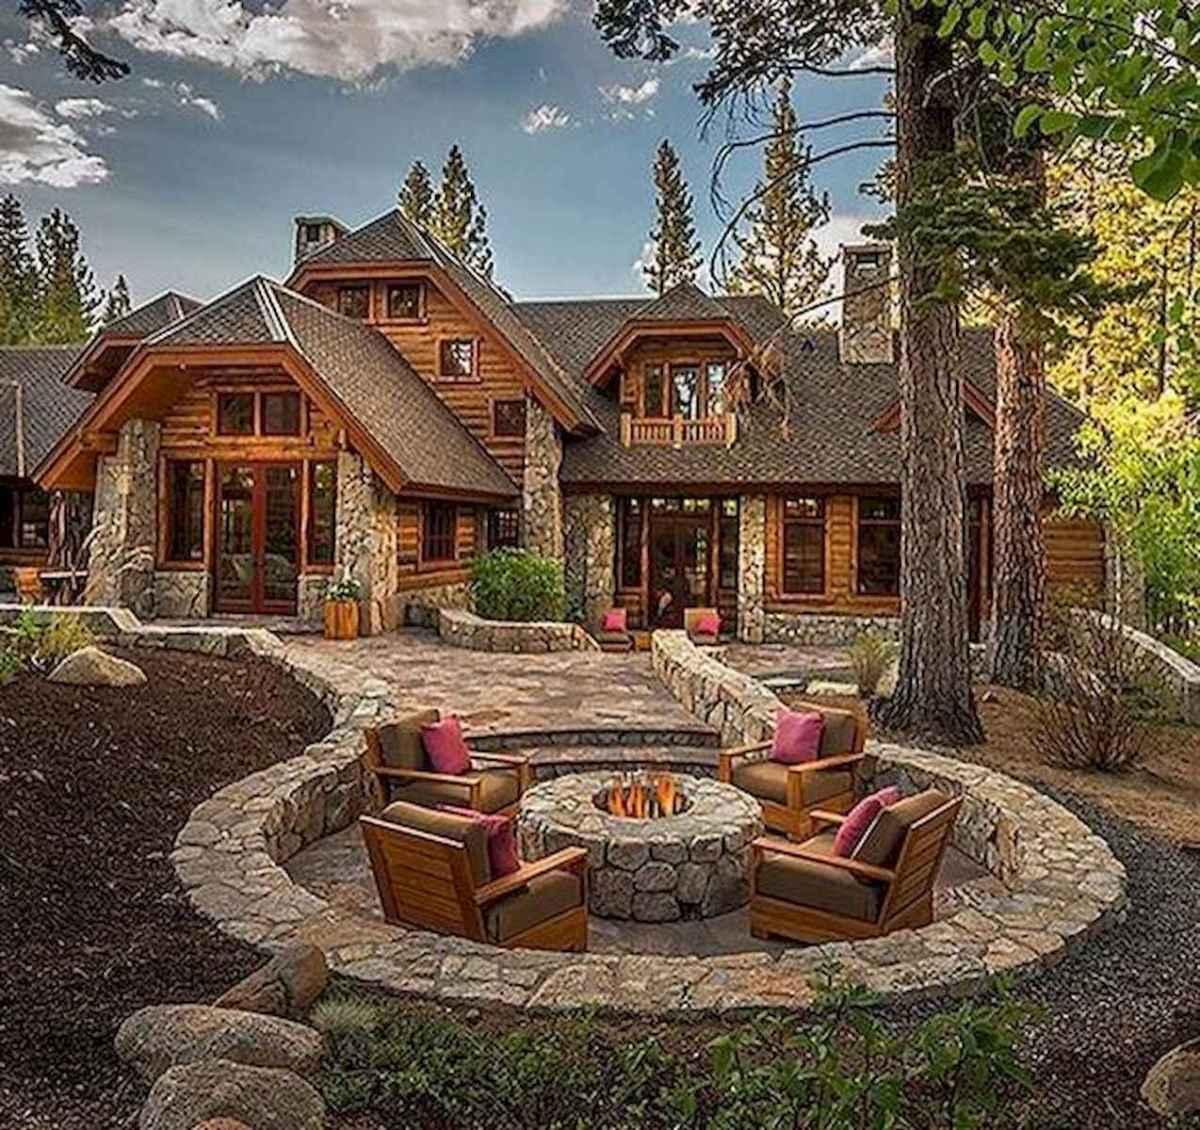 50 Best Log Cabin Homes Modern Design Ideas (9)